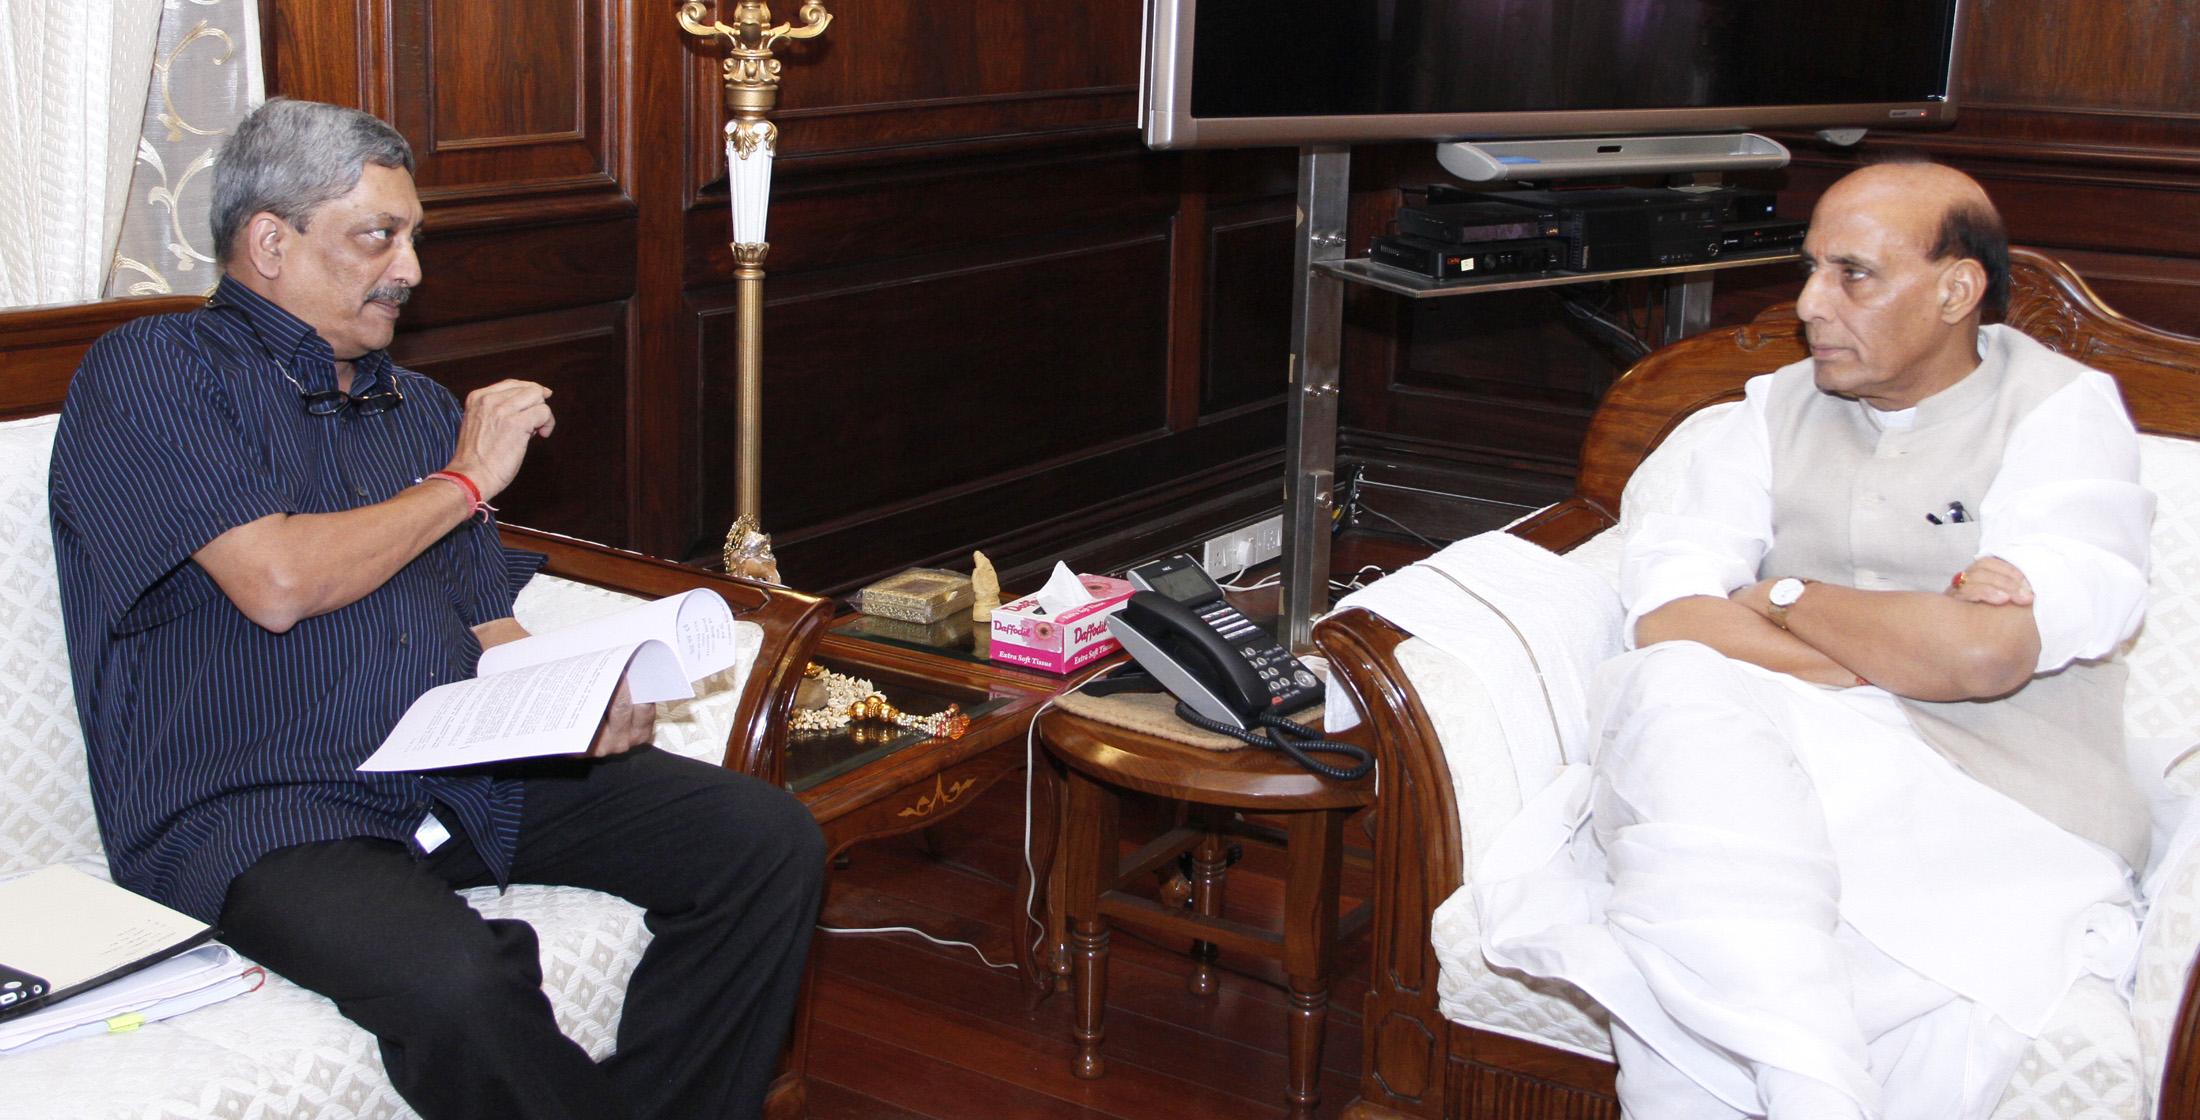 The Union Minister for Defence, Shri Manohar Parrikar calling on the Union Home Minister, Shri Rajnath Singh, in New Delhi on June 29, 2015.